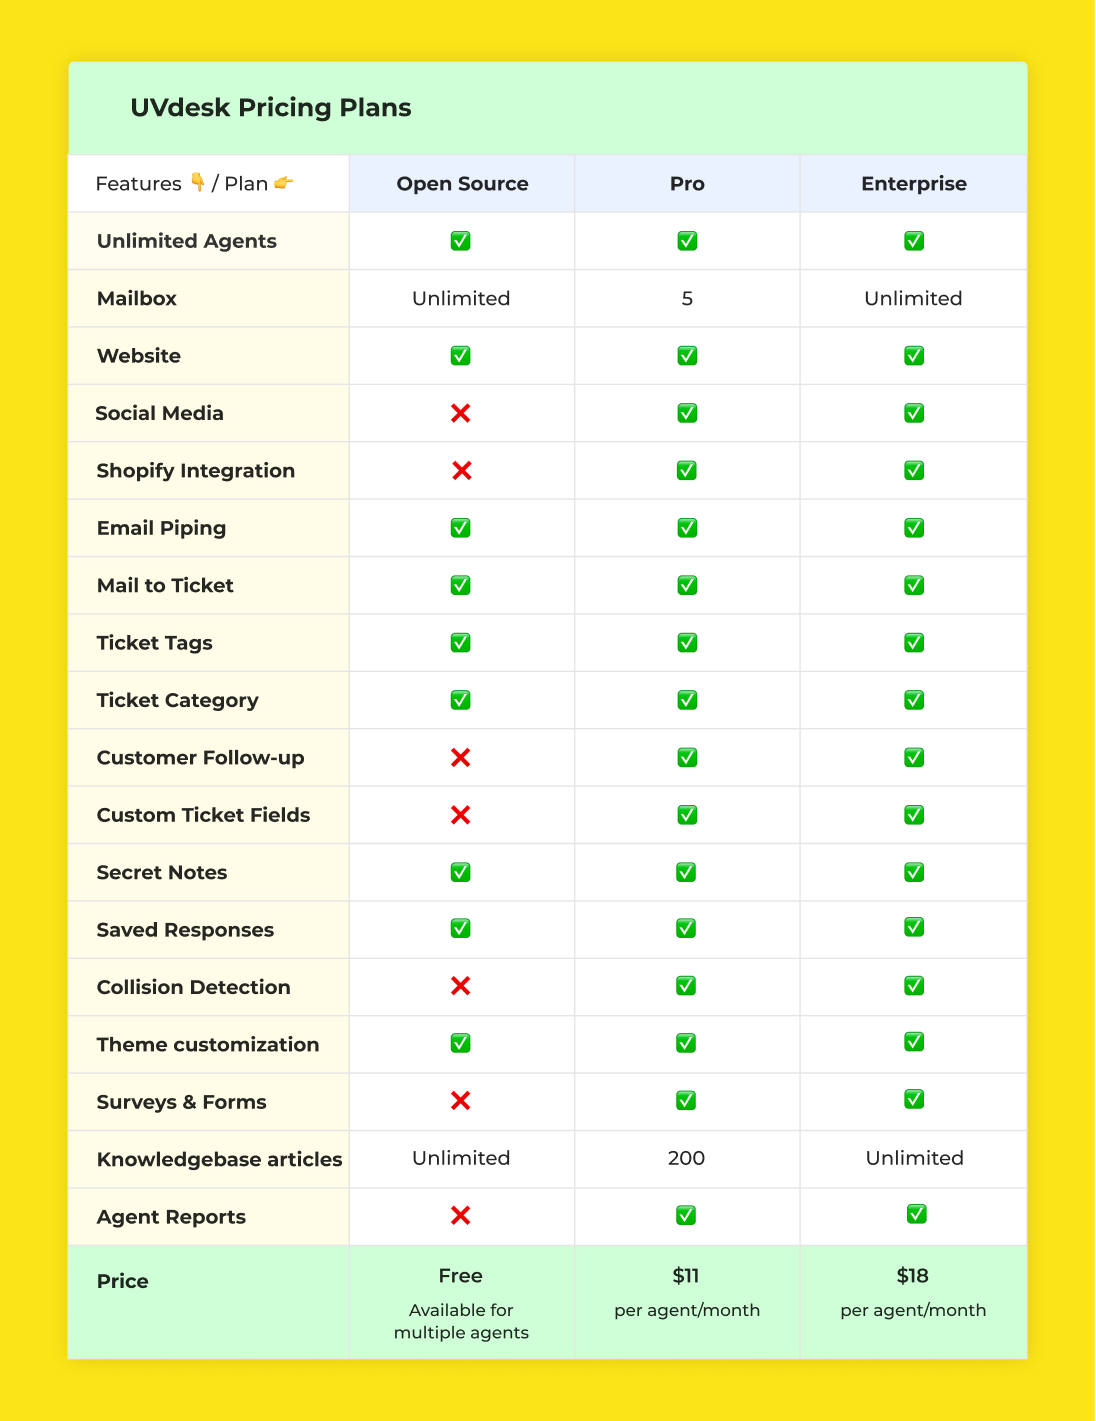 UVdesk pricing plans comparison